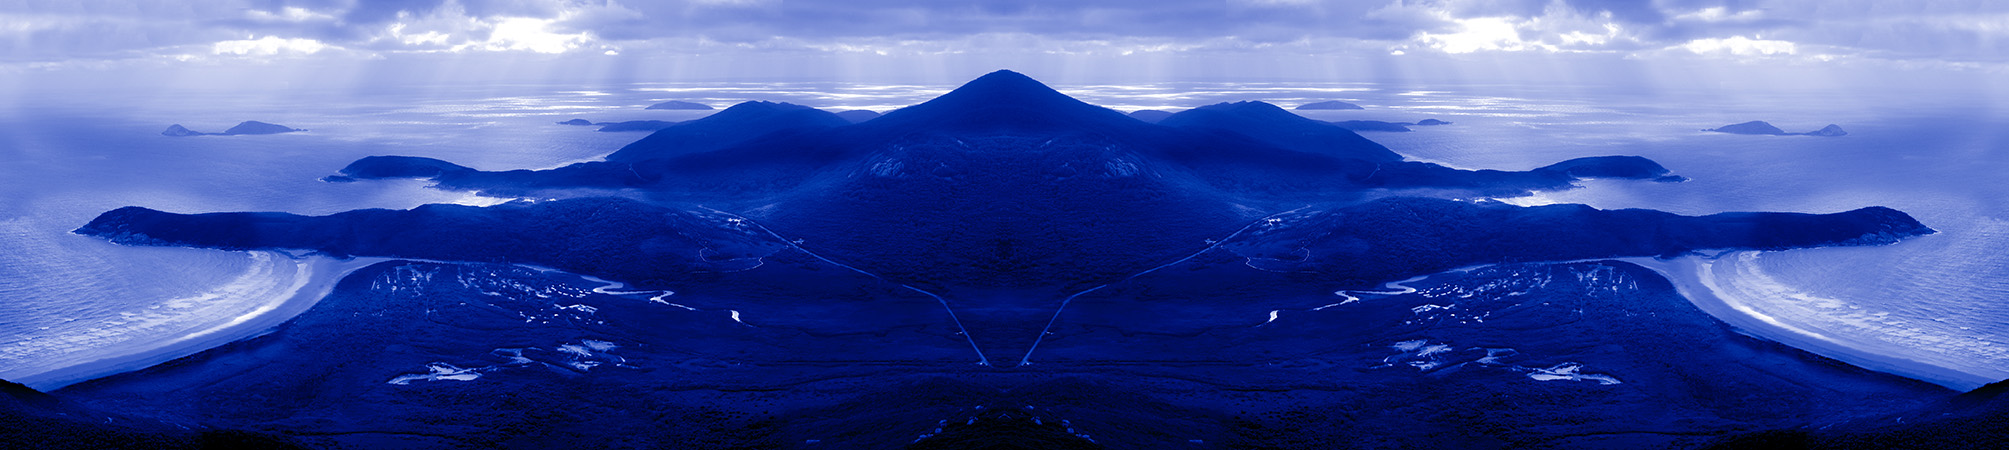 Tidal River mirror